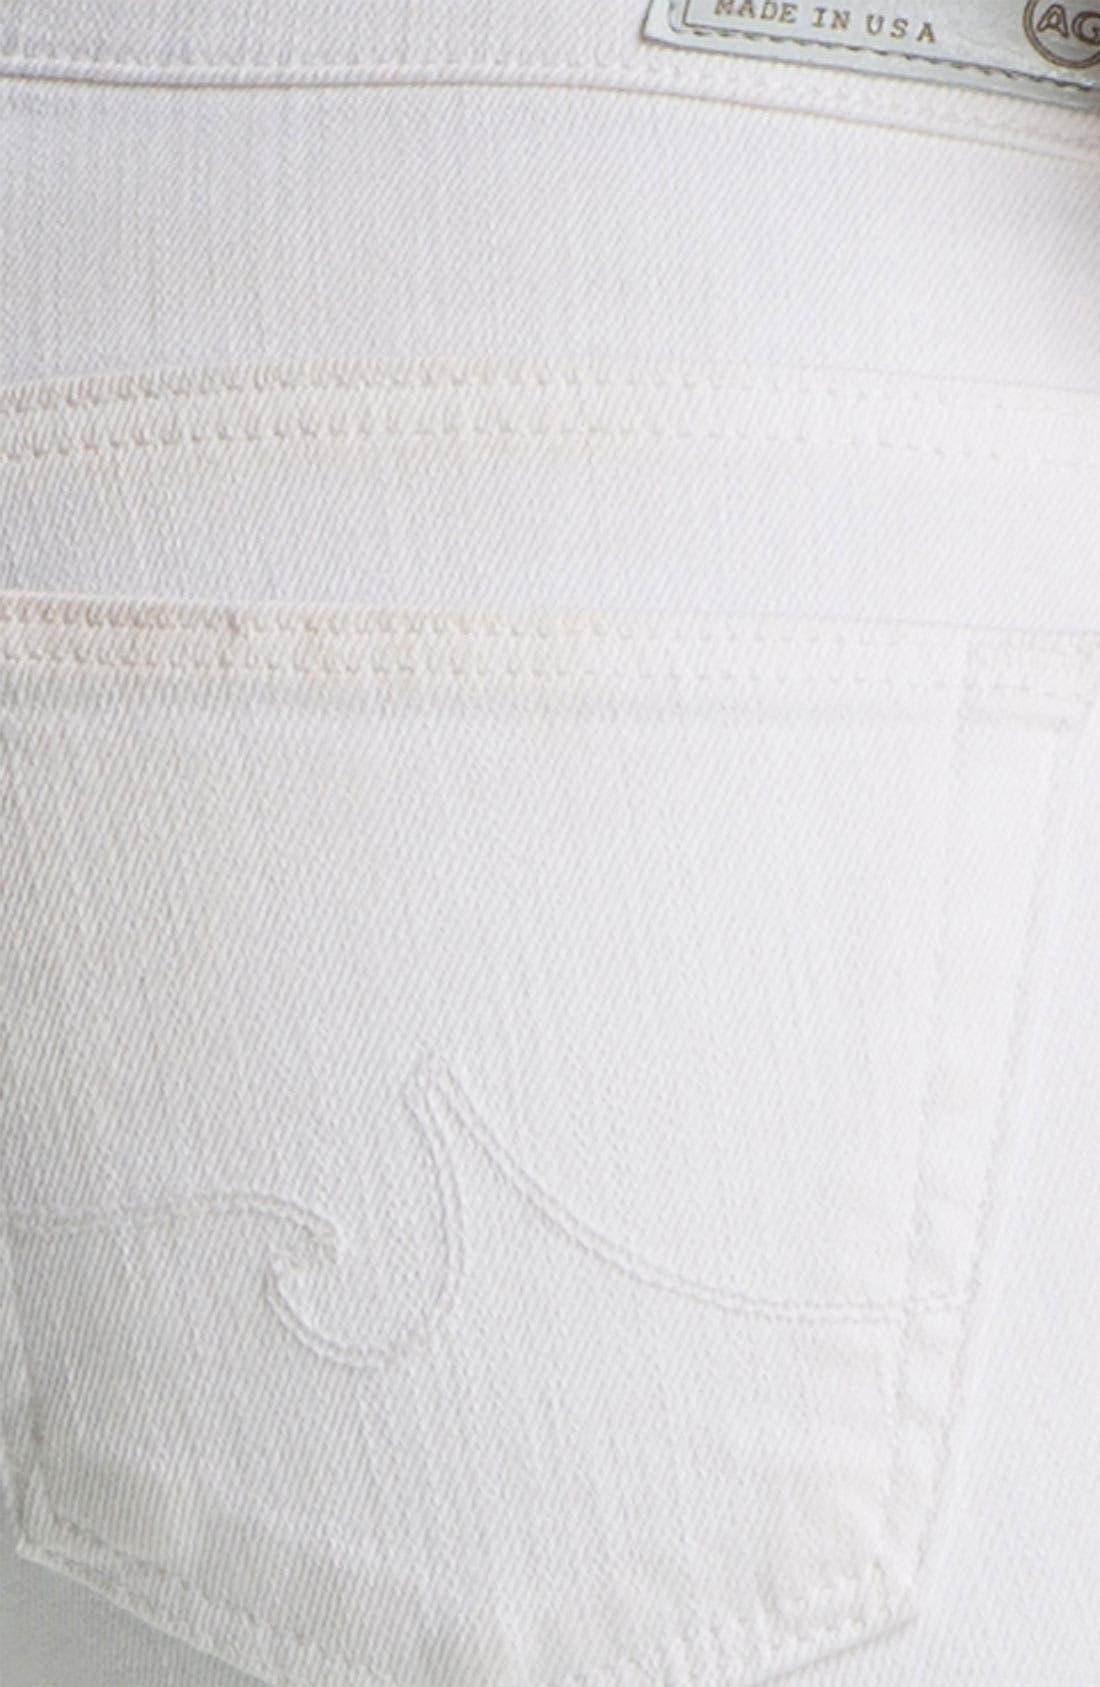 AG, Jeans 'Stilt' Cigarette Leg Stretch Jeans, Alternate thumbnail 4, color, 100